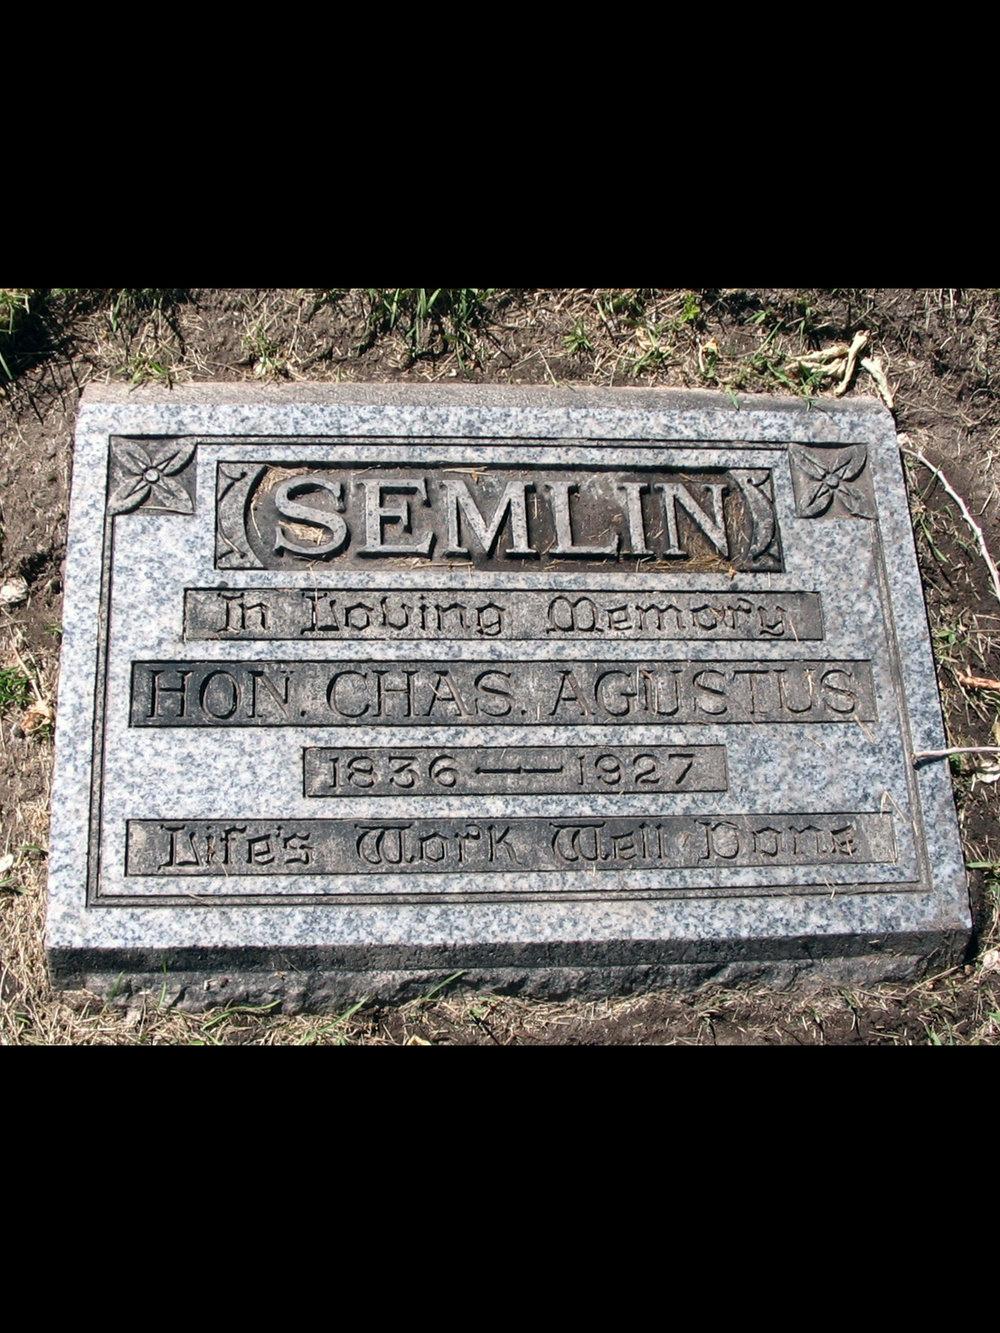 Charles Semlin